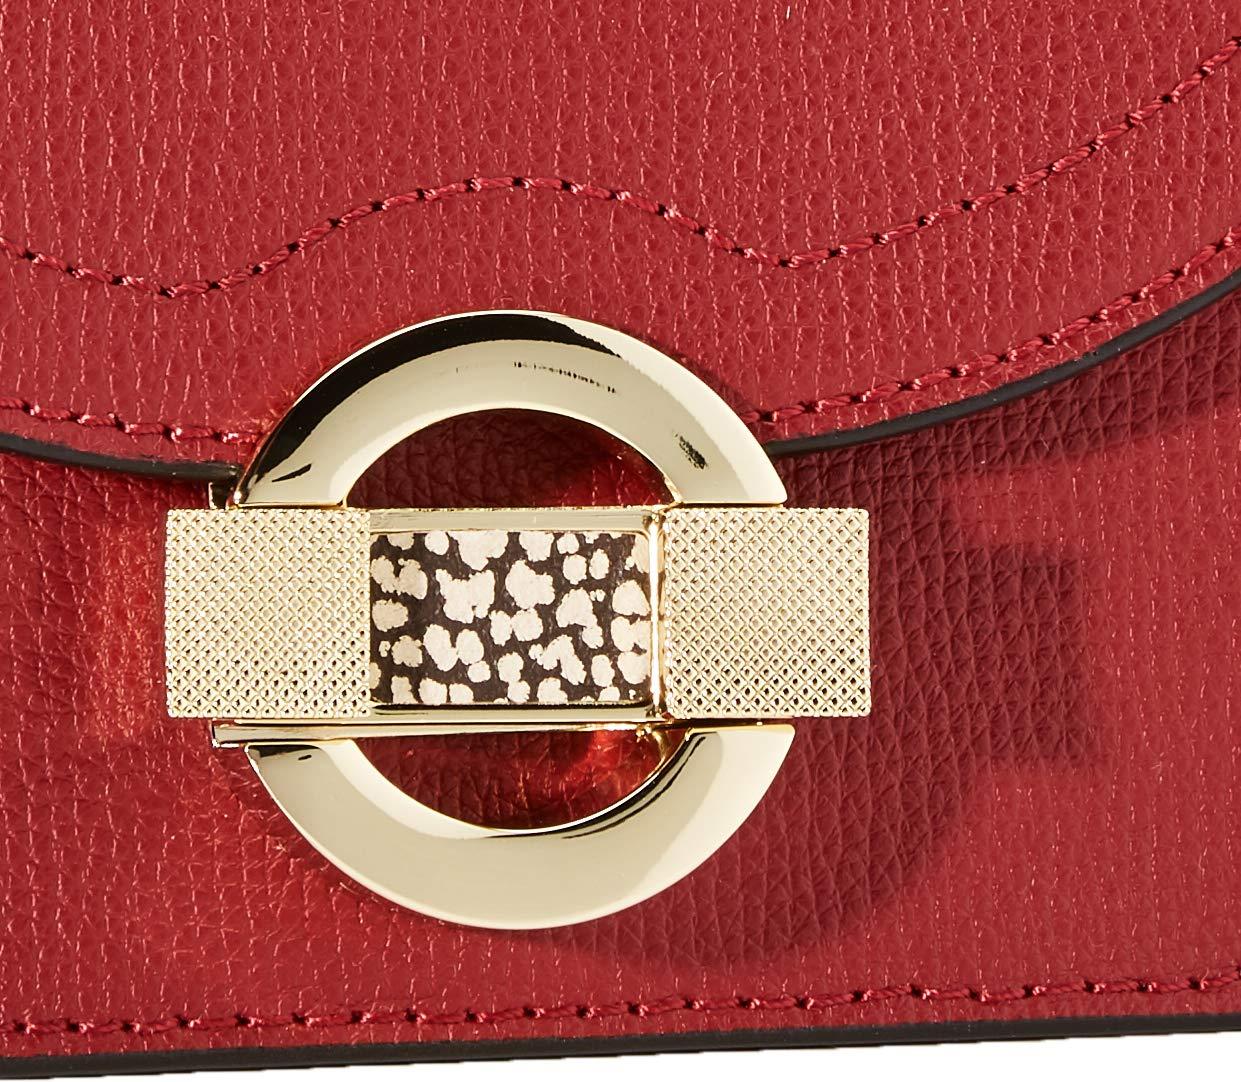 Borbonese dam Tracolla liten axelväska, 16 x 11,5 x 9 centimeter Röd (pärla/Op naturlig)